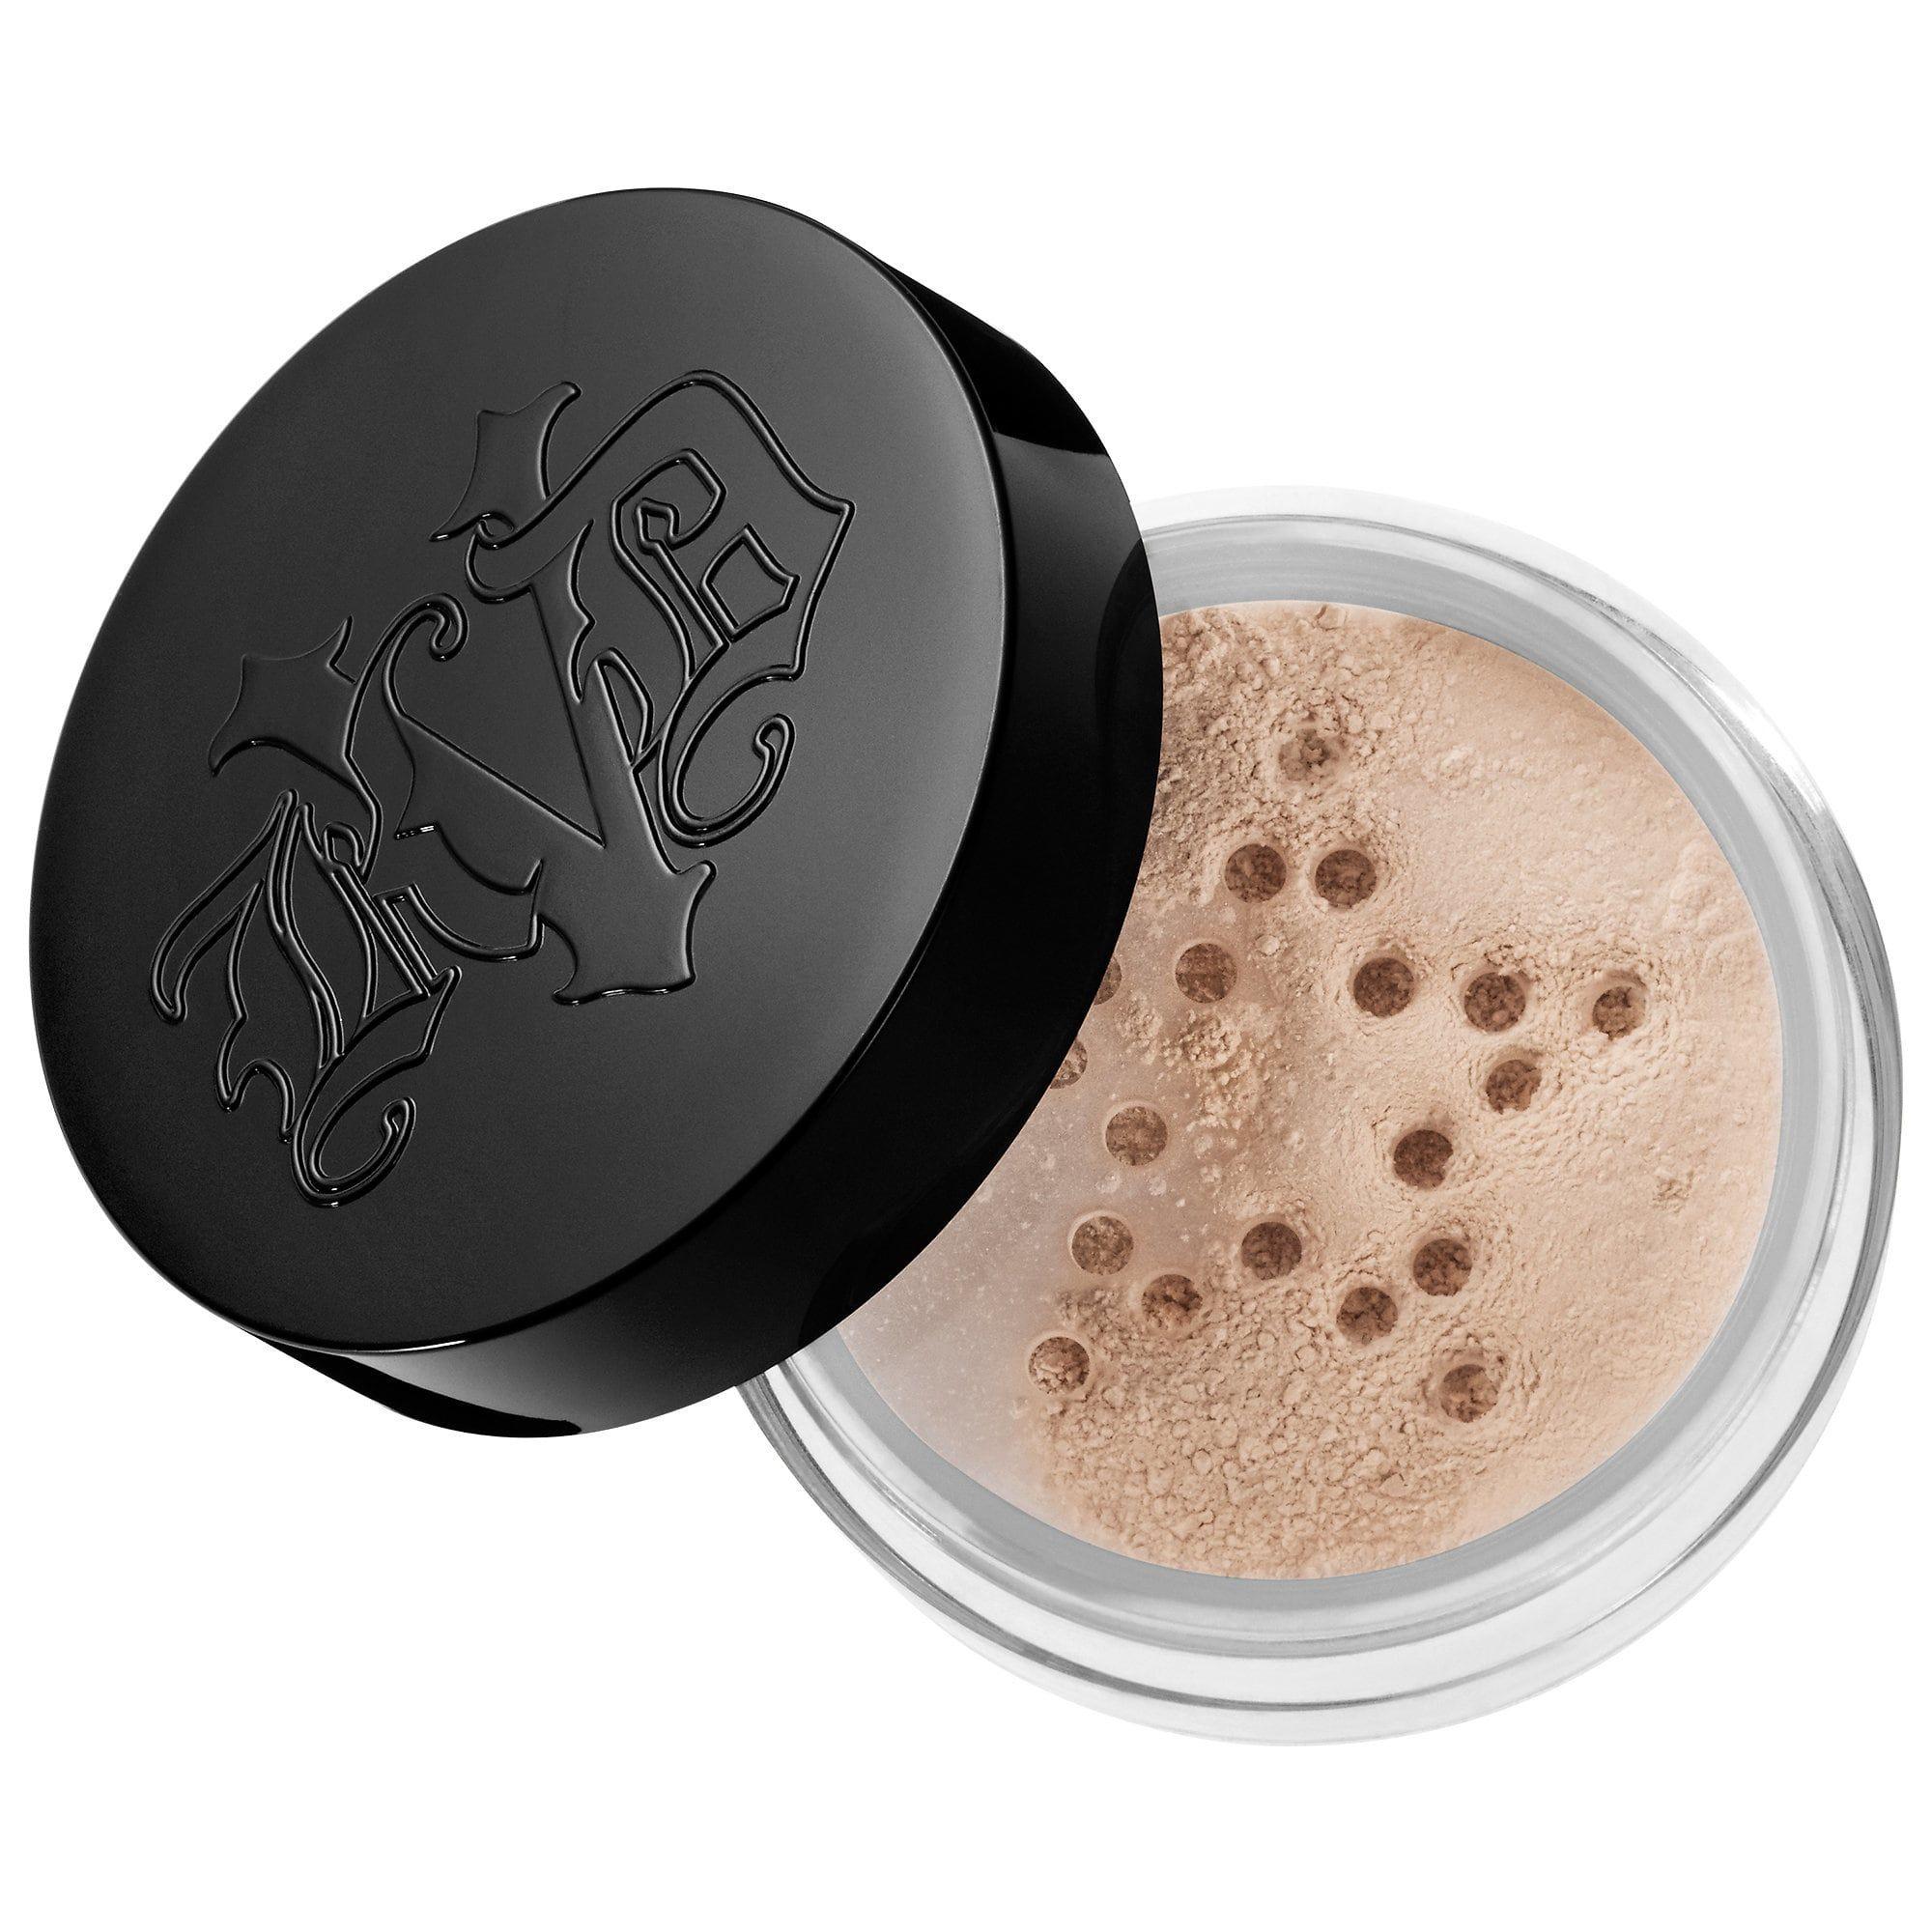 Pin By Savy Leon On Makeup In 2020 Setting Powder Powder Makeup Kat Von D Makeup